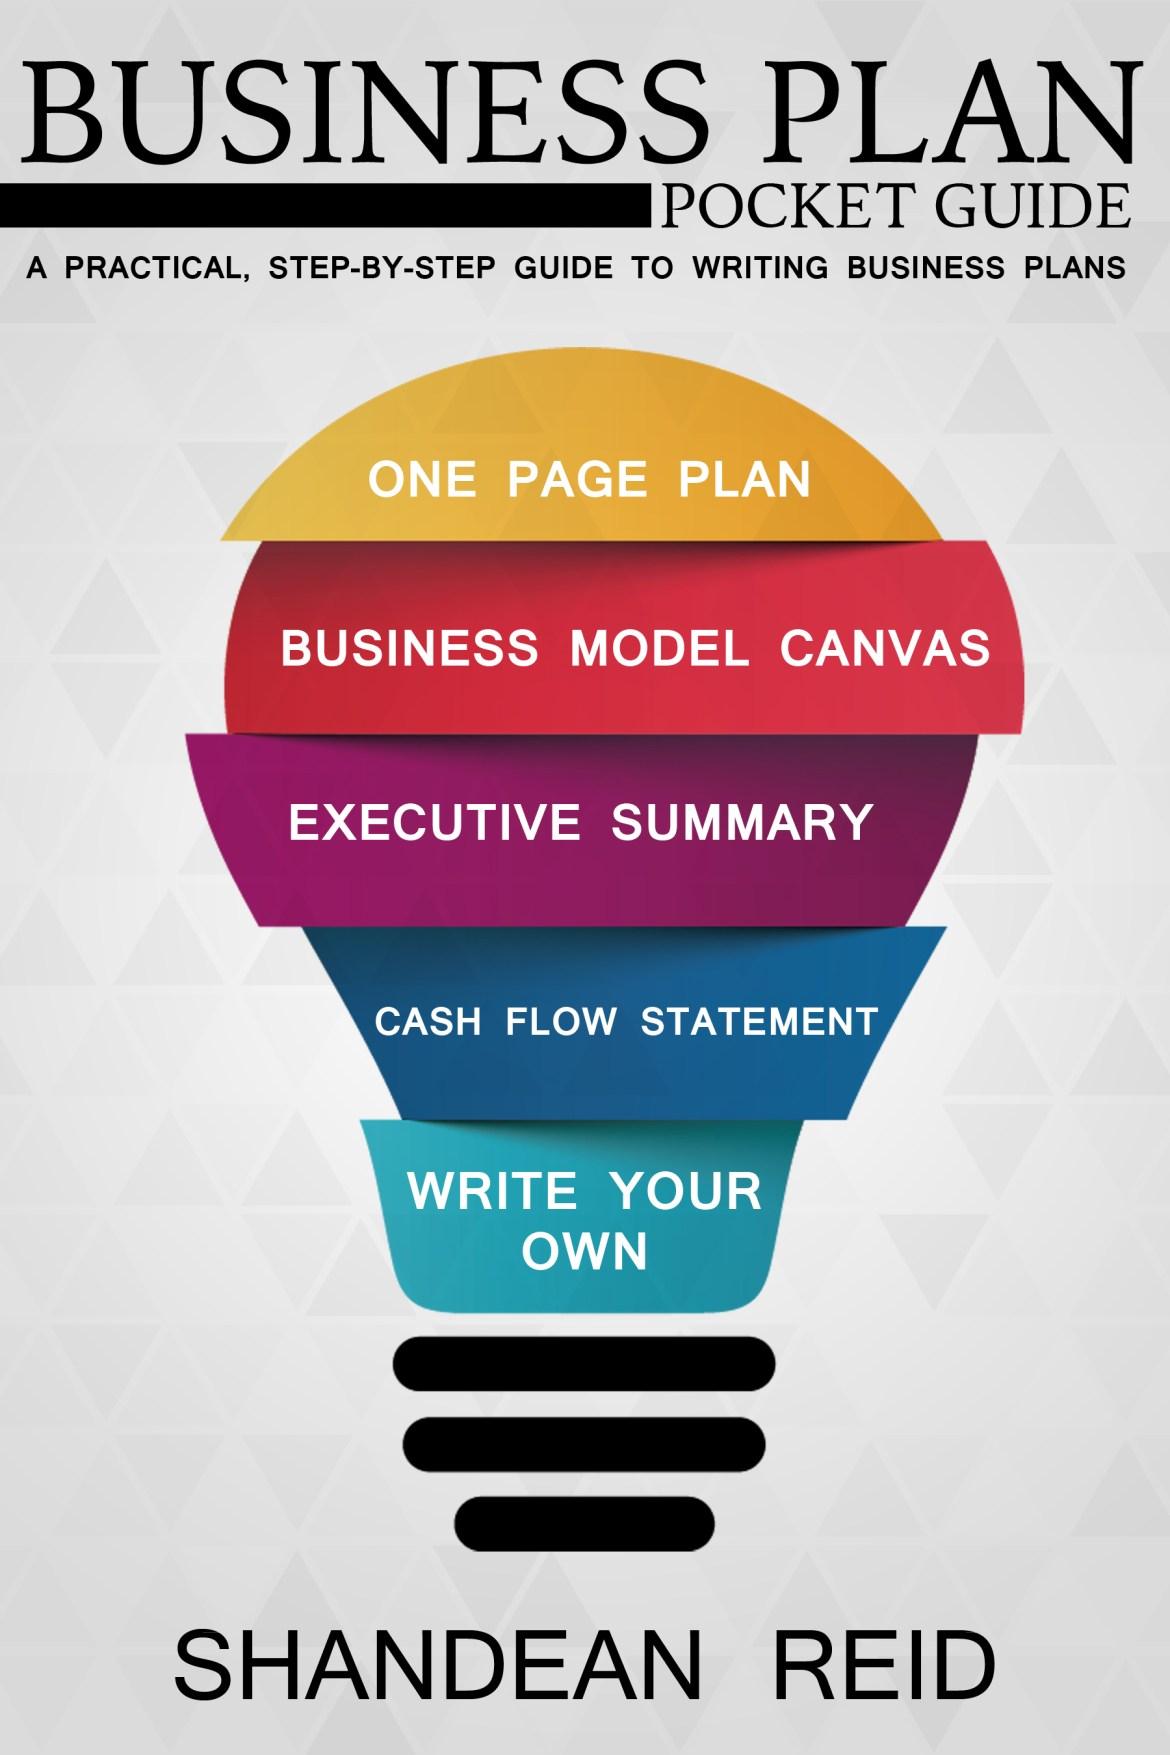 business plan book jamaican author Shandean Reid